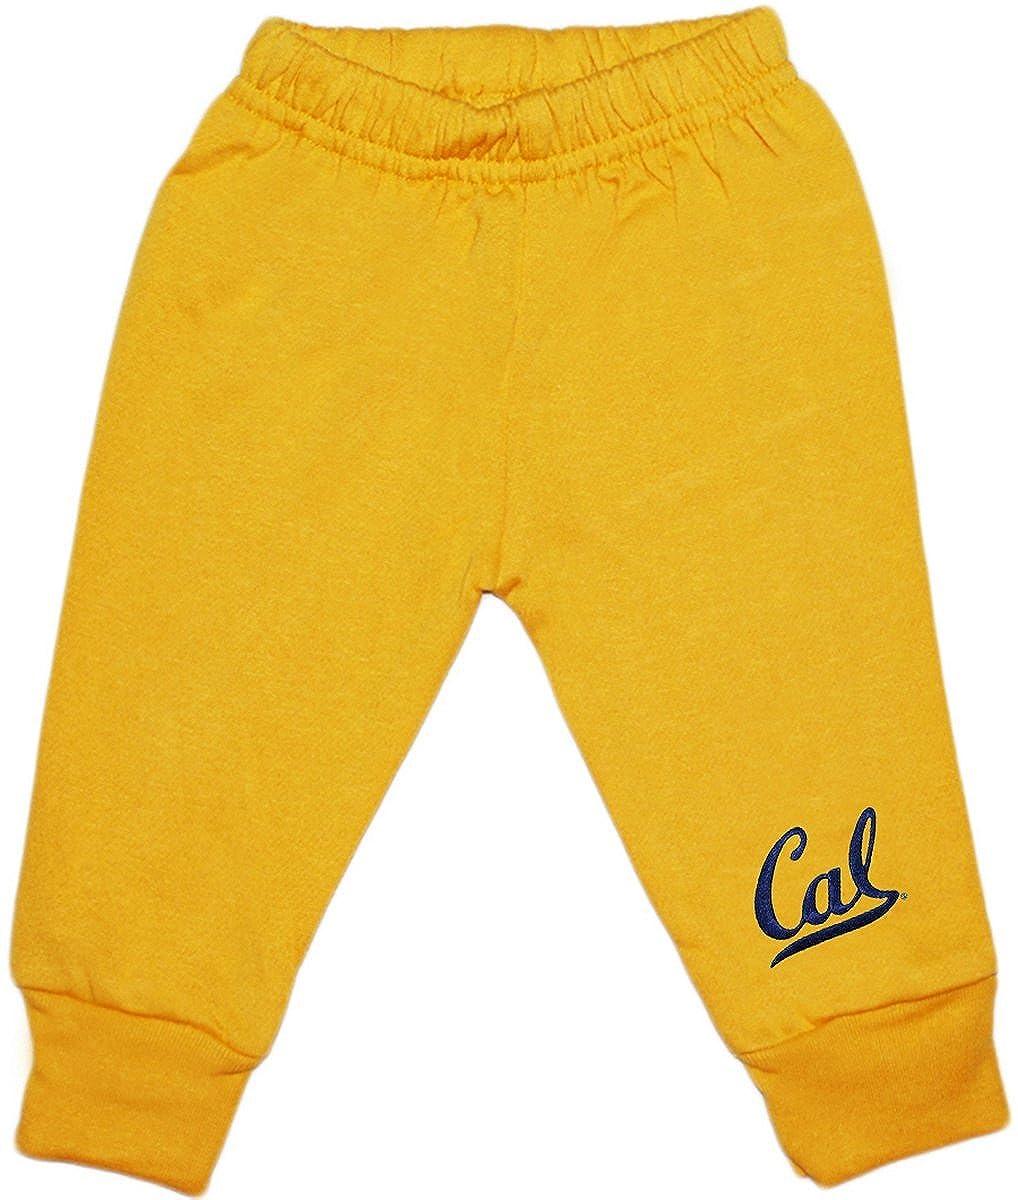 Creative Knitwear University of California at Berkeley Cal Baby and Toddler Sweat Pants